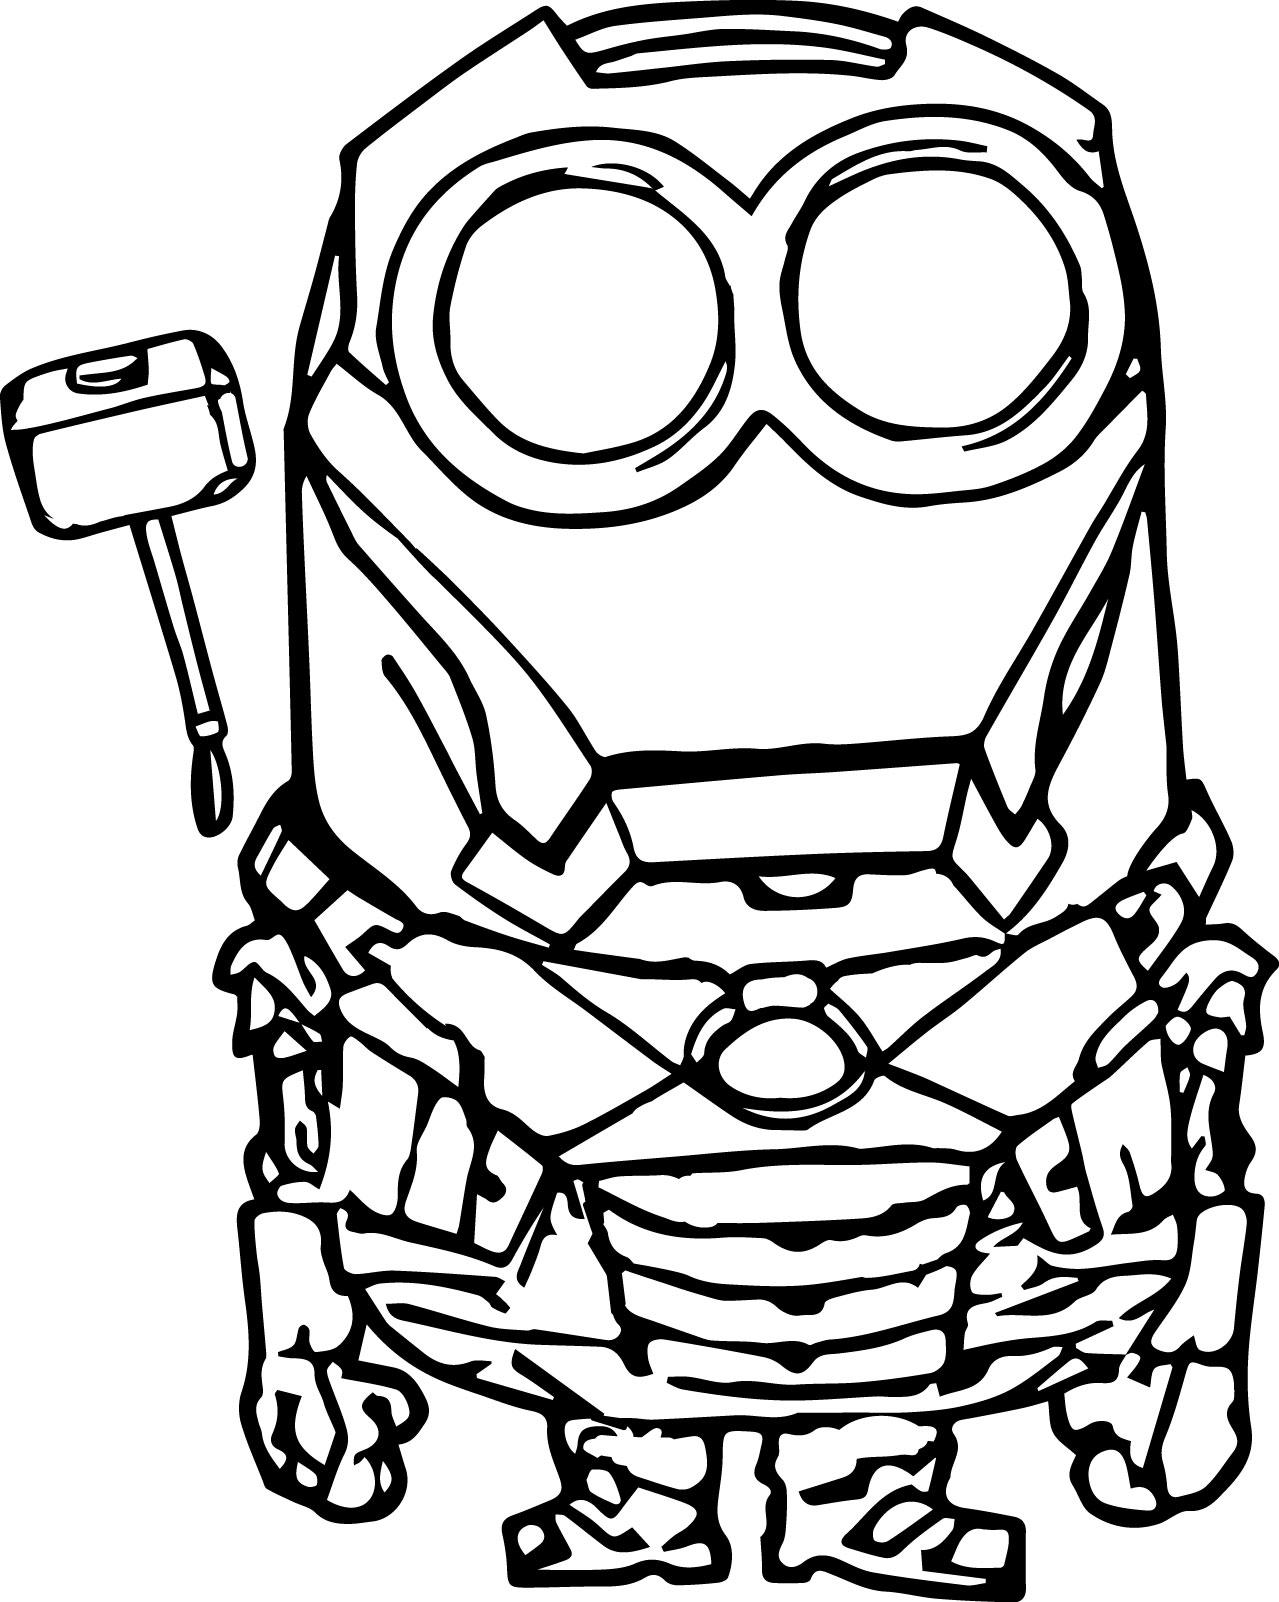 1279x1602 Robot Minion Coloring Page Wecoloringpage